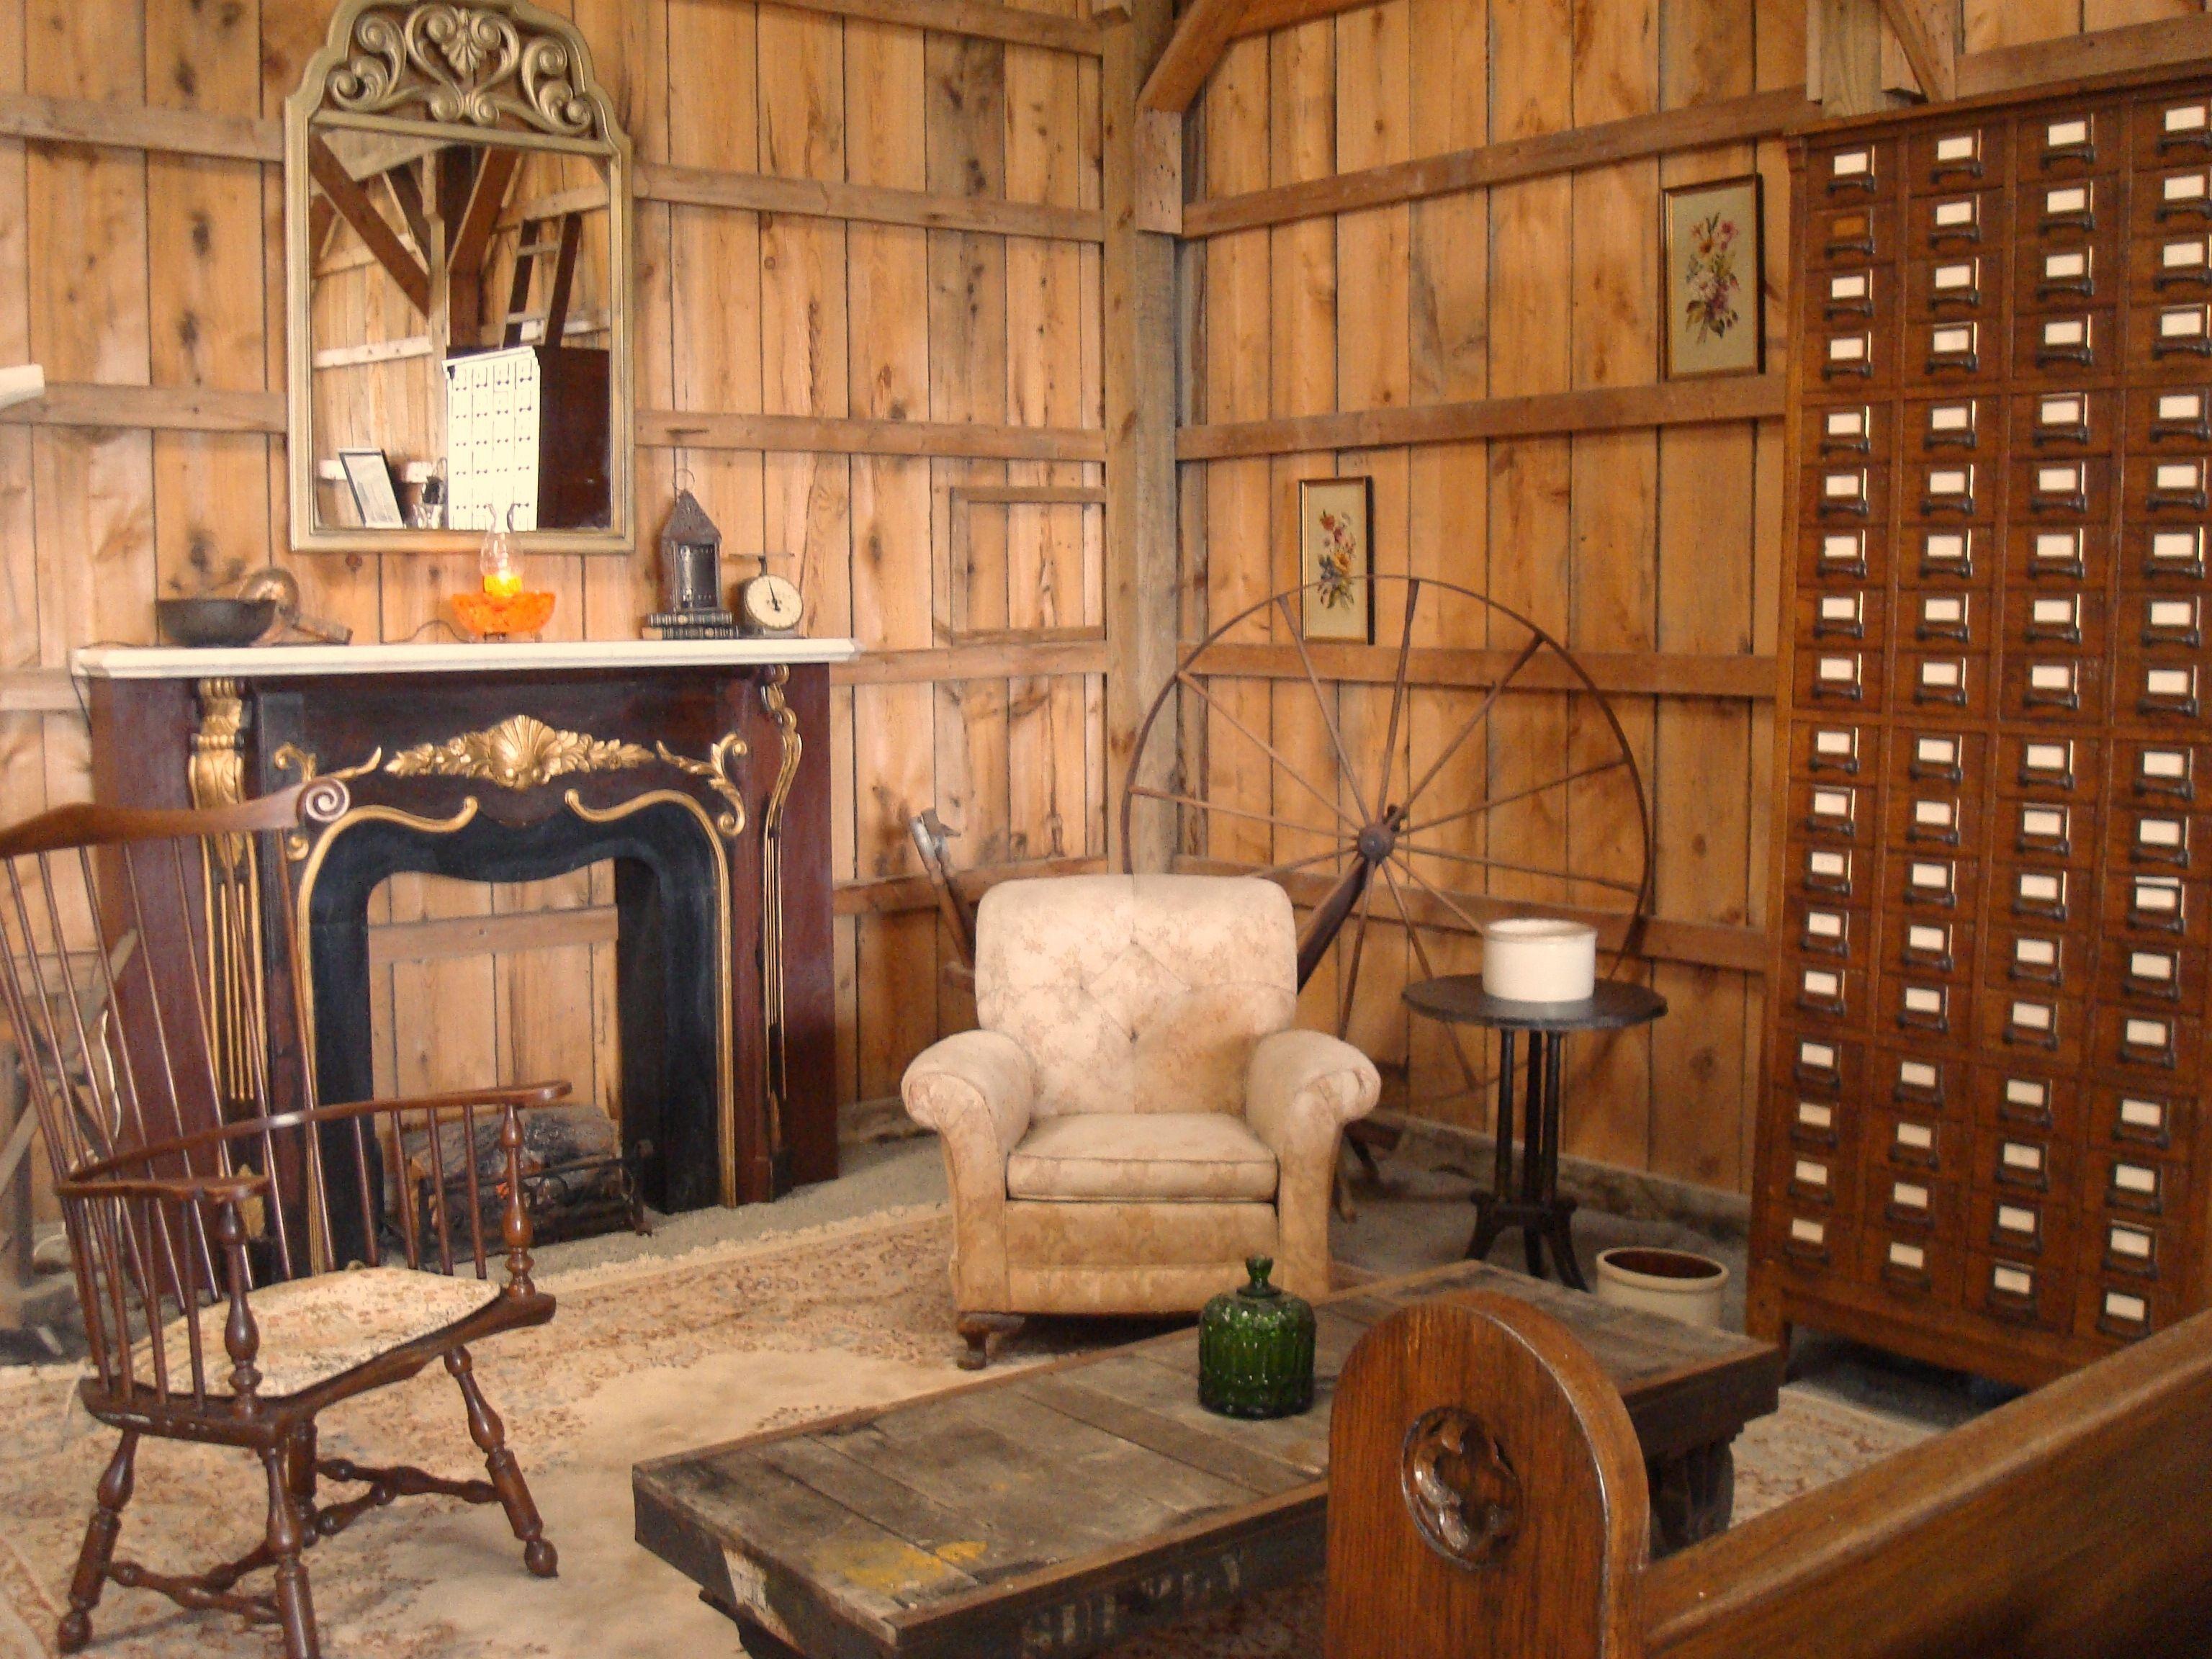 Rustic Cabin Interior Wall Ideas